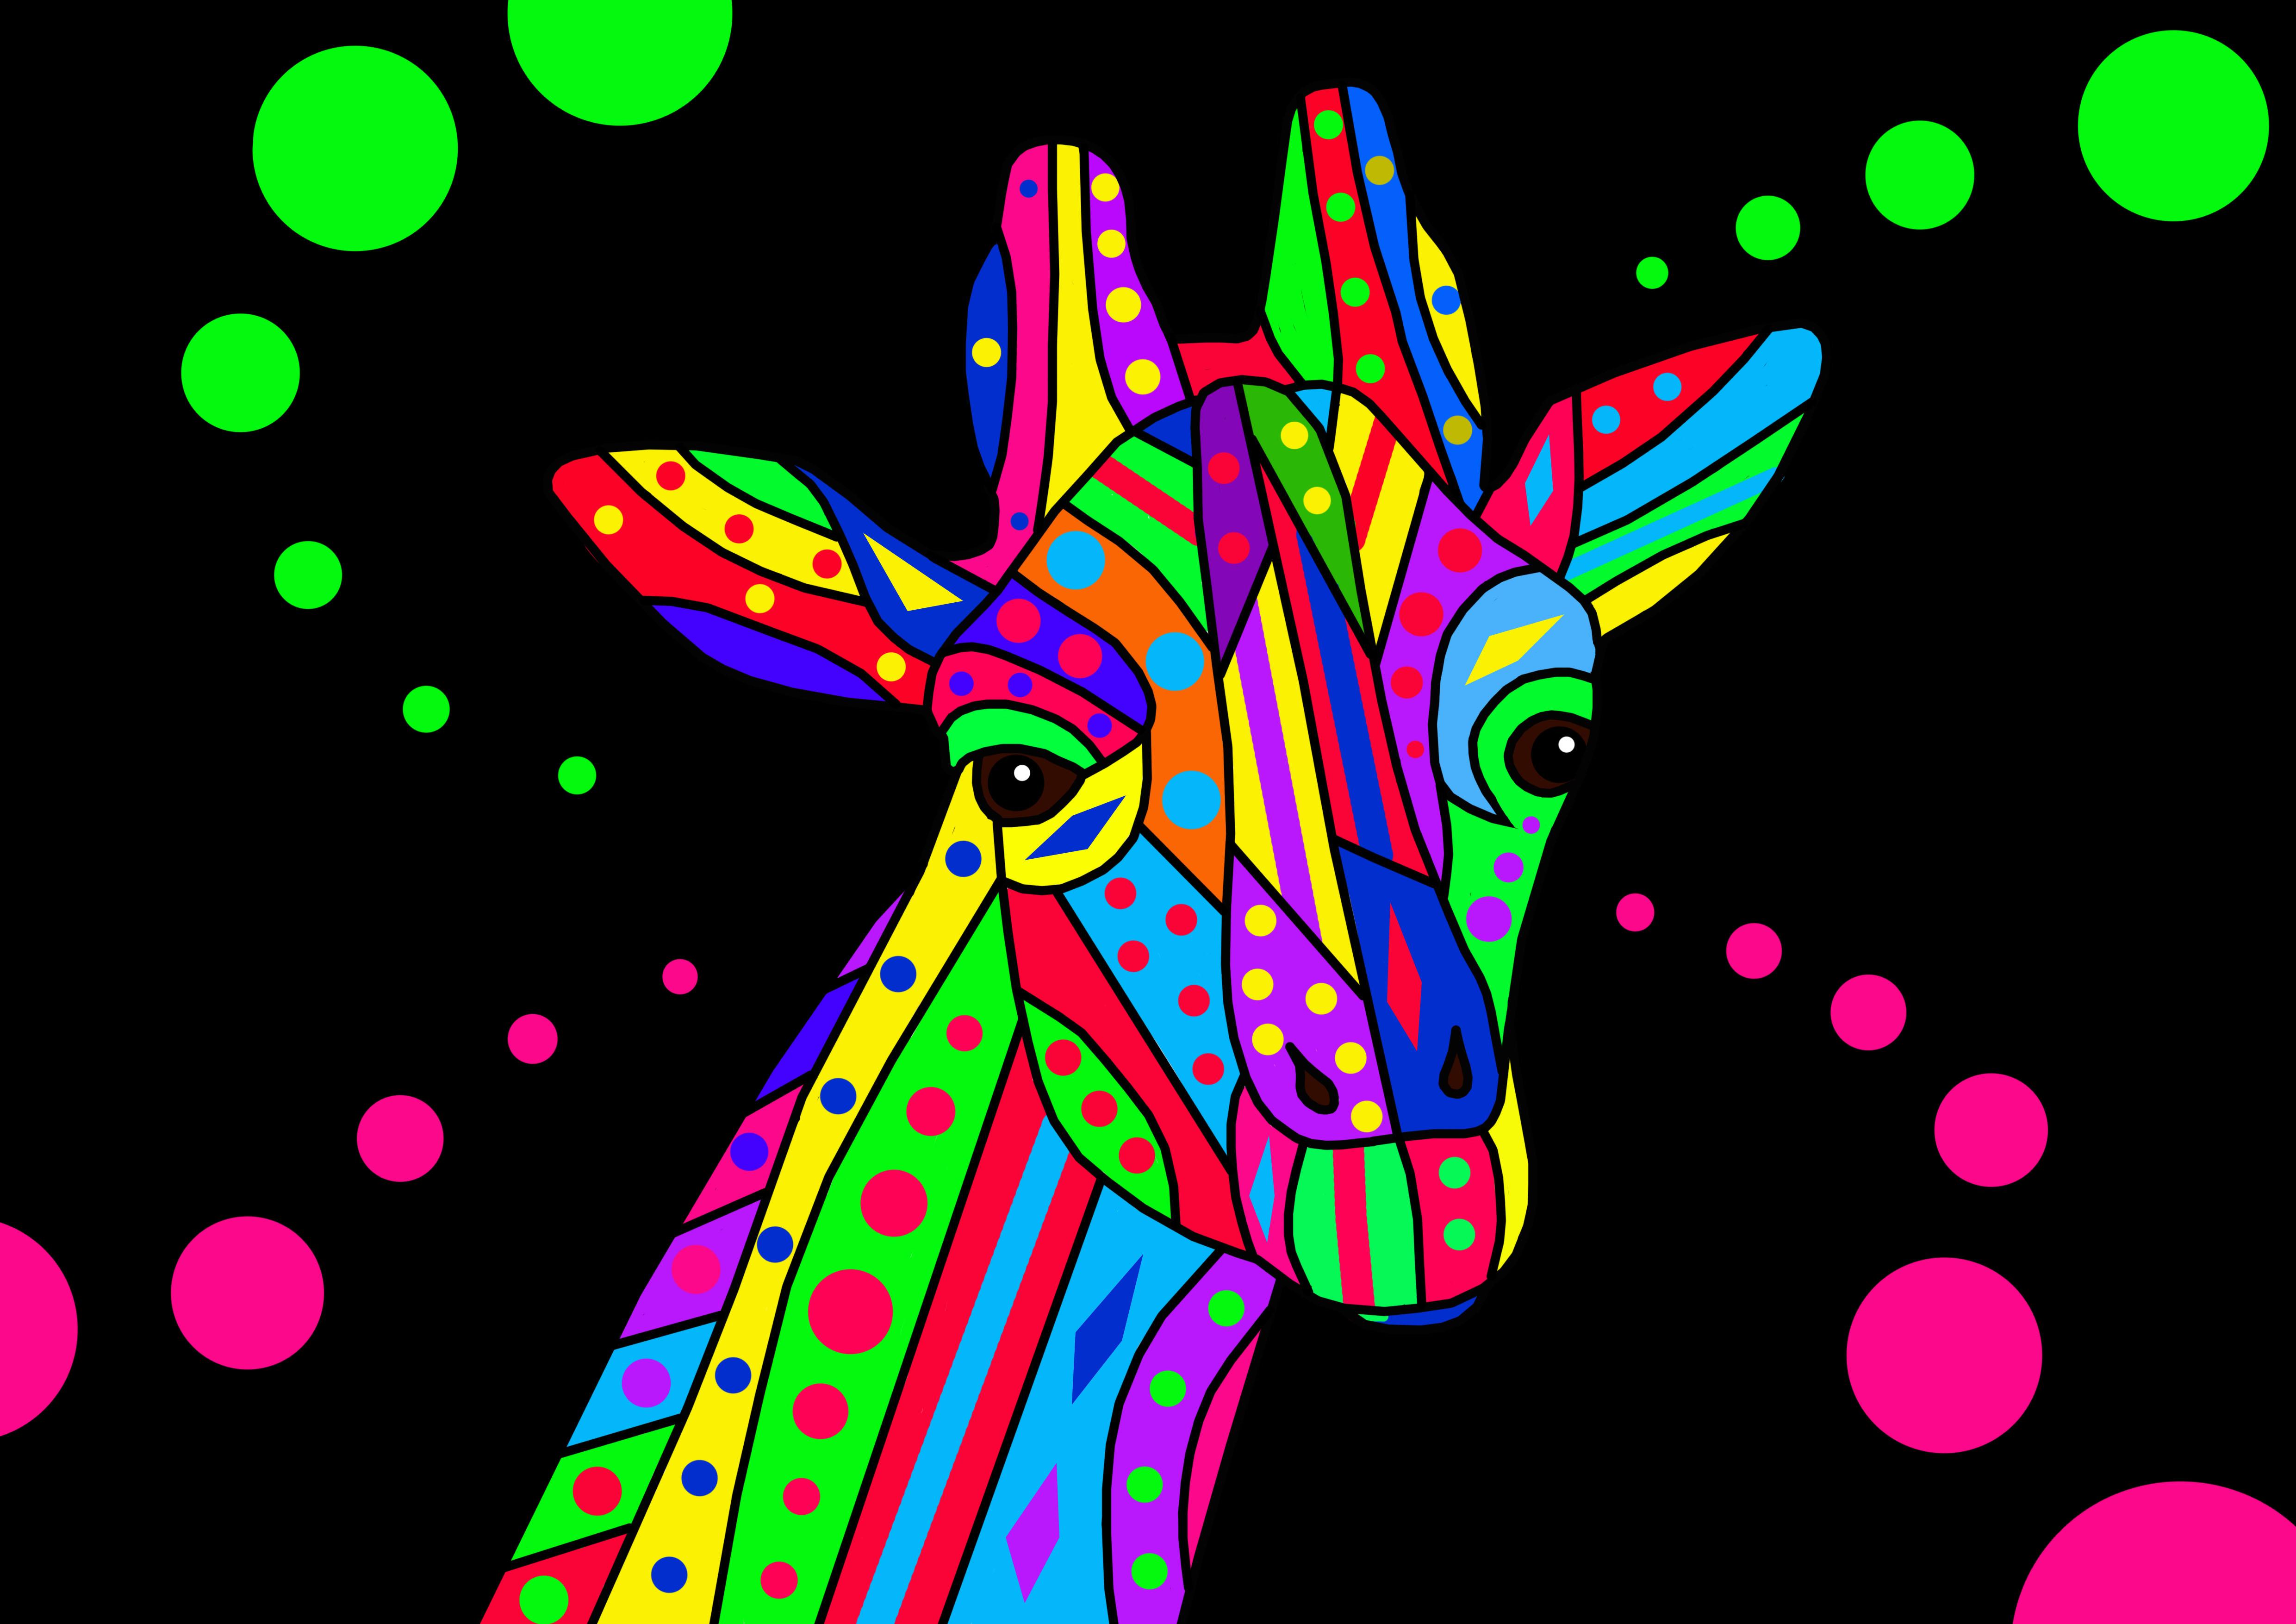 giraffe with background